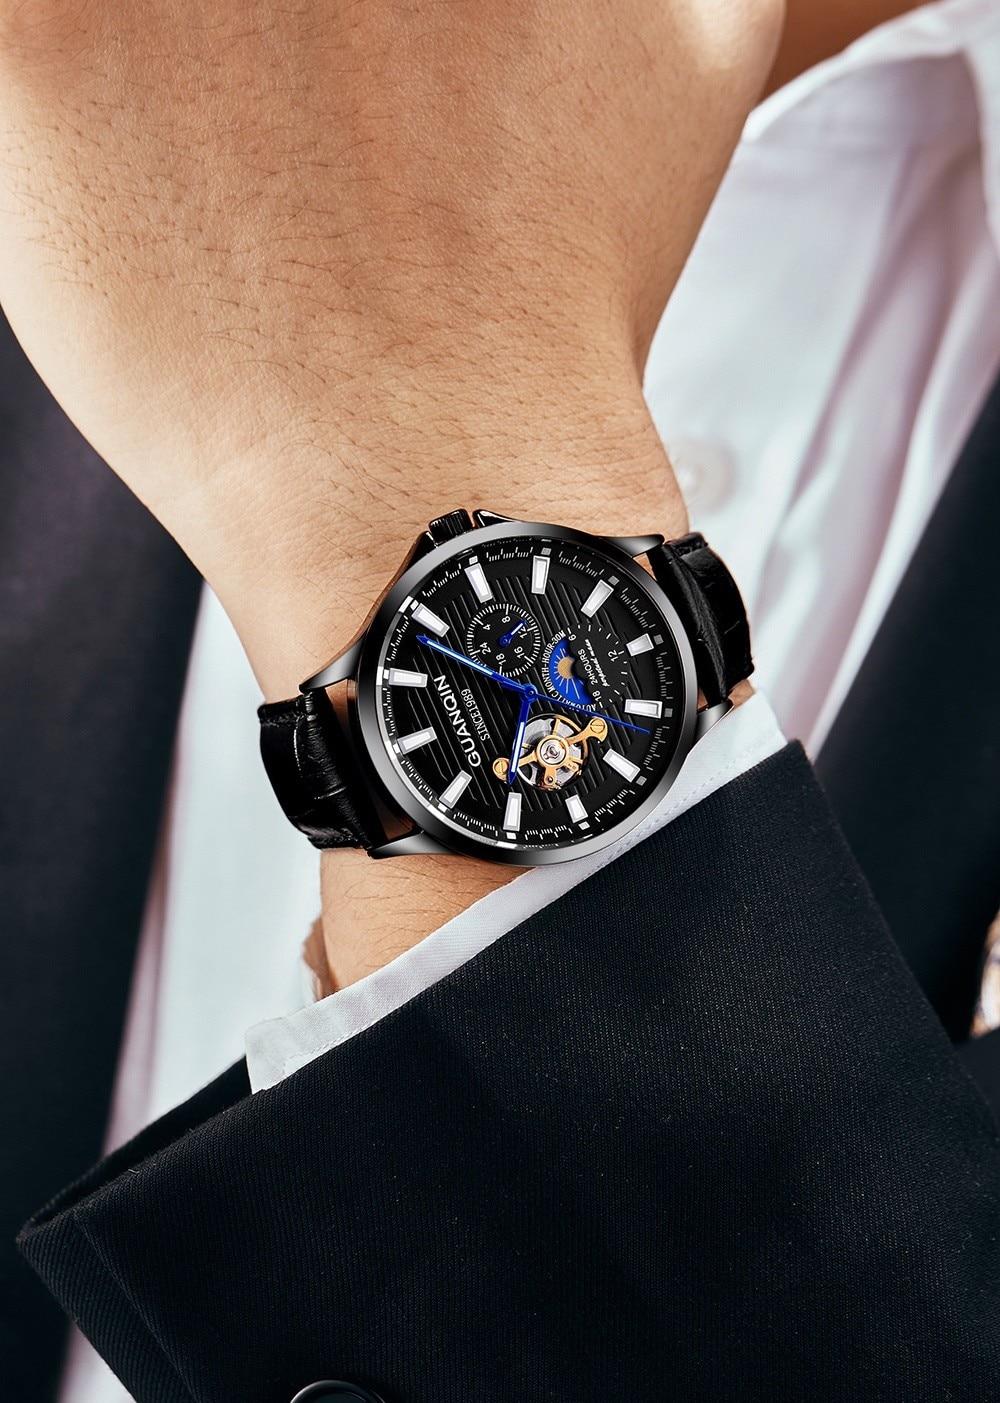 H6cffe77d01784becafe806da4d47694dN GUANQIN 2019 automatic watch clock men waterproof stainless steel mechanical top brand luxury skeleton watch relogio masculino